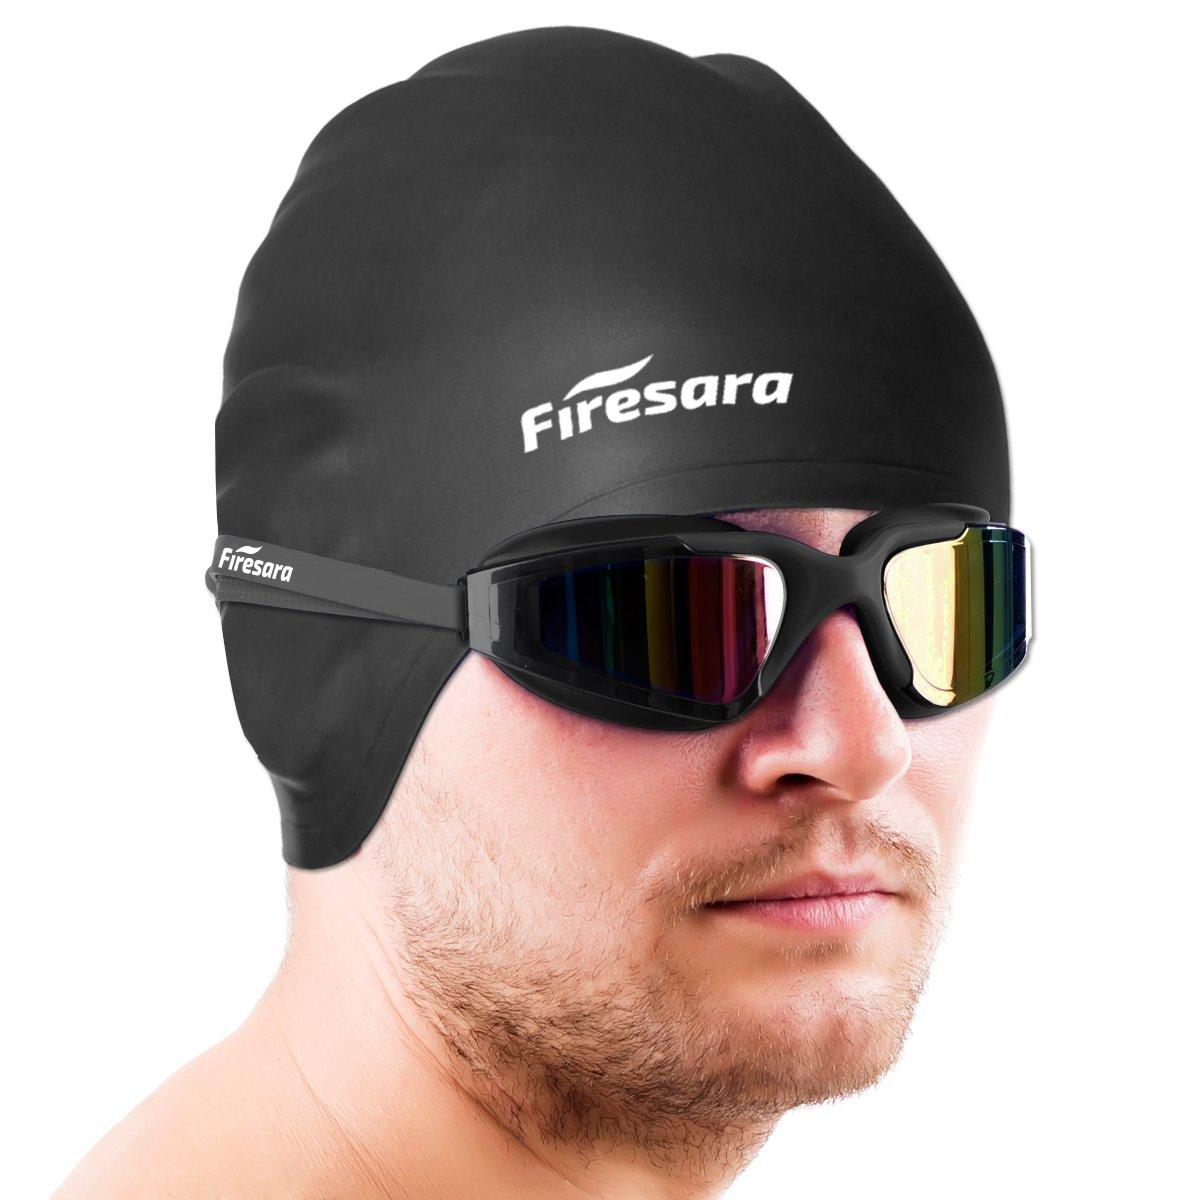 44b0fd5c5575 Firesara Swim Cap Swim Goggles